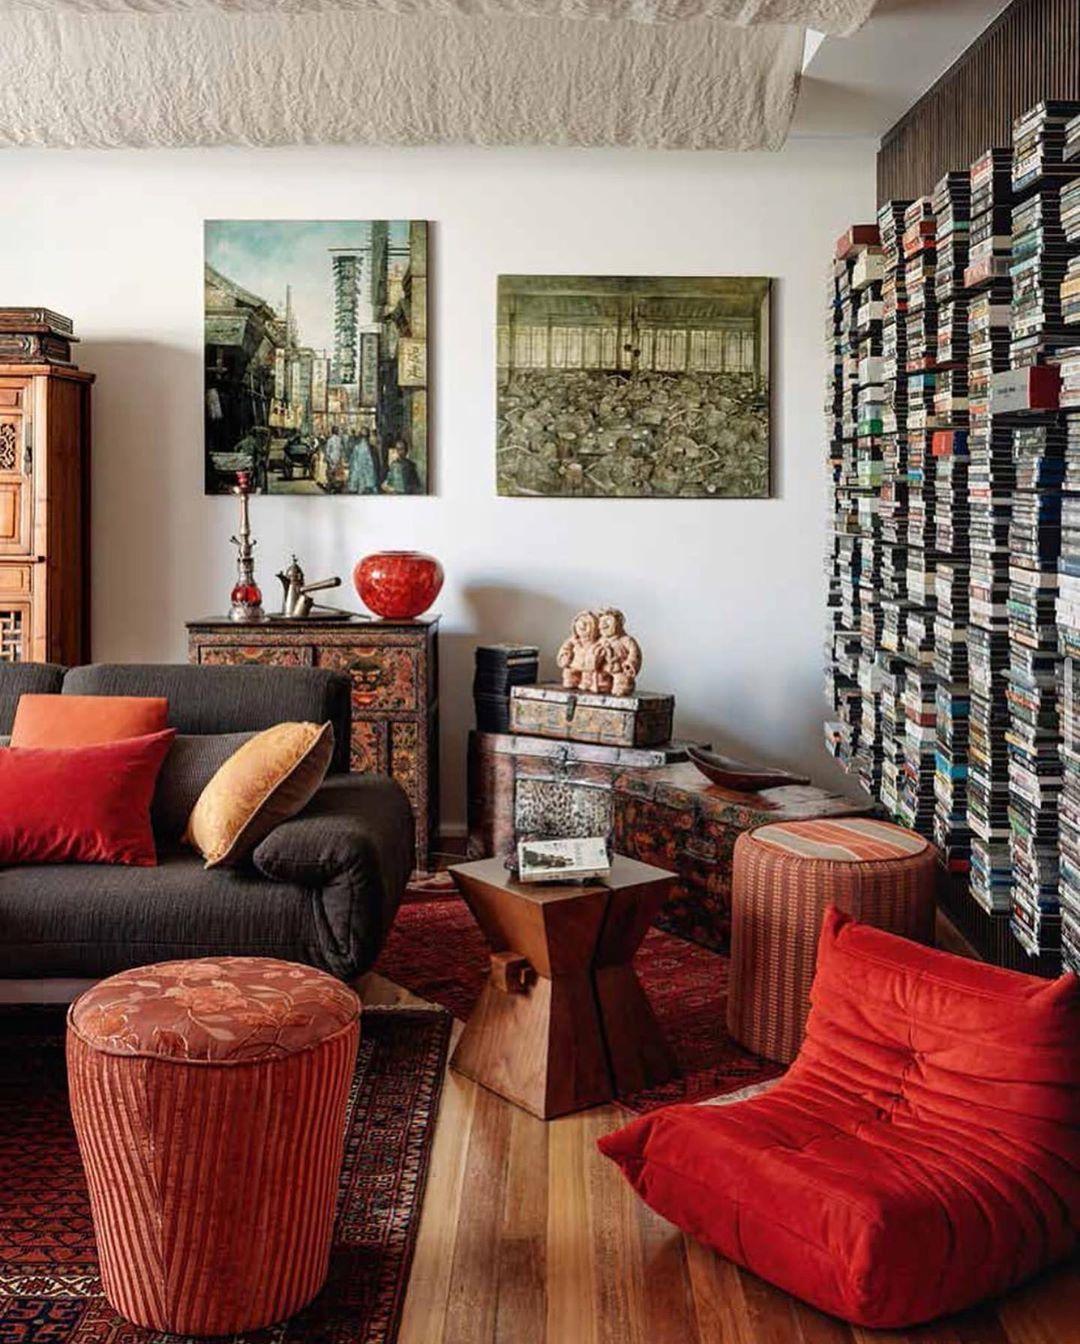 "Marc Costa on Instagram: ""RED #red #interiors #interiordesign #design @danielfintzi #architecture #architecturaldigest #homedecor #decor #lifestyle #instadaily…"""